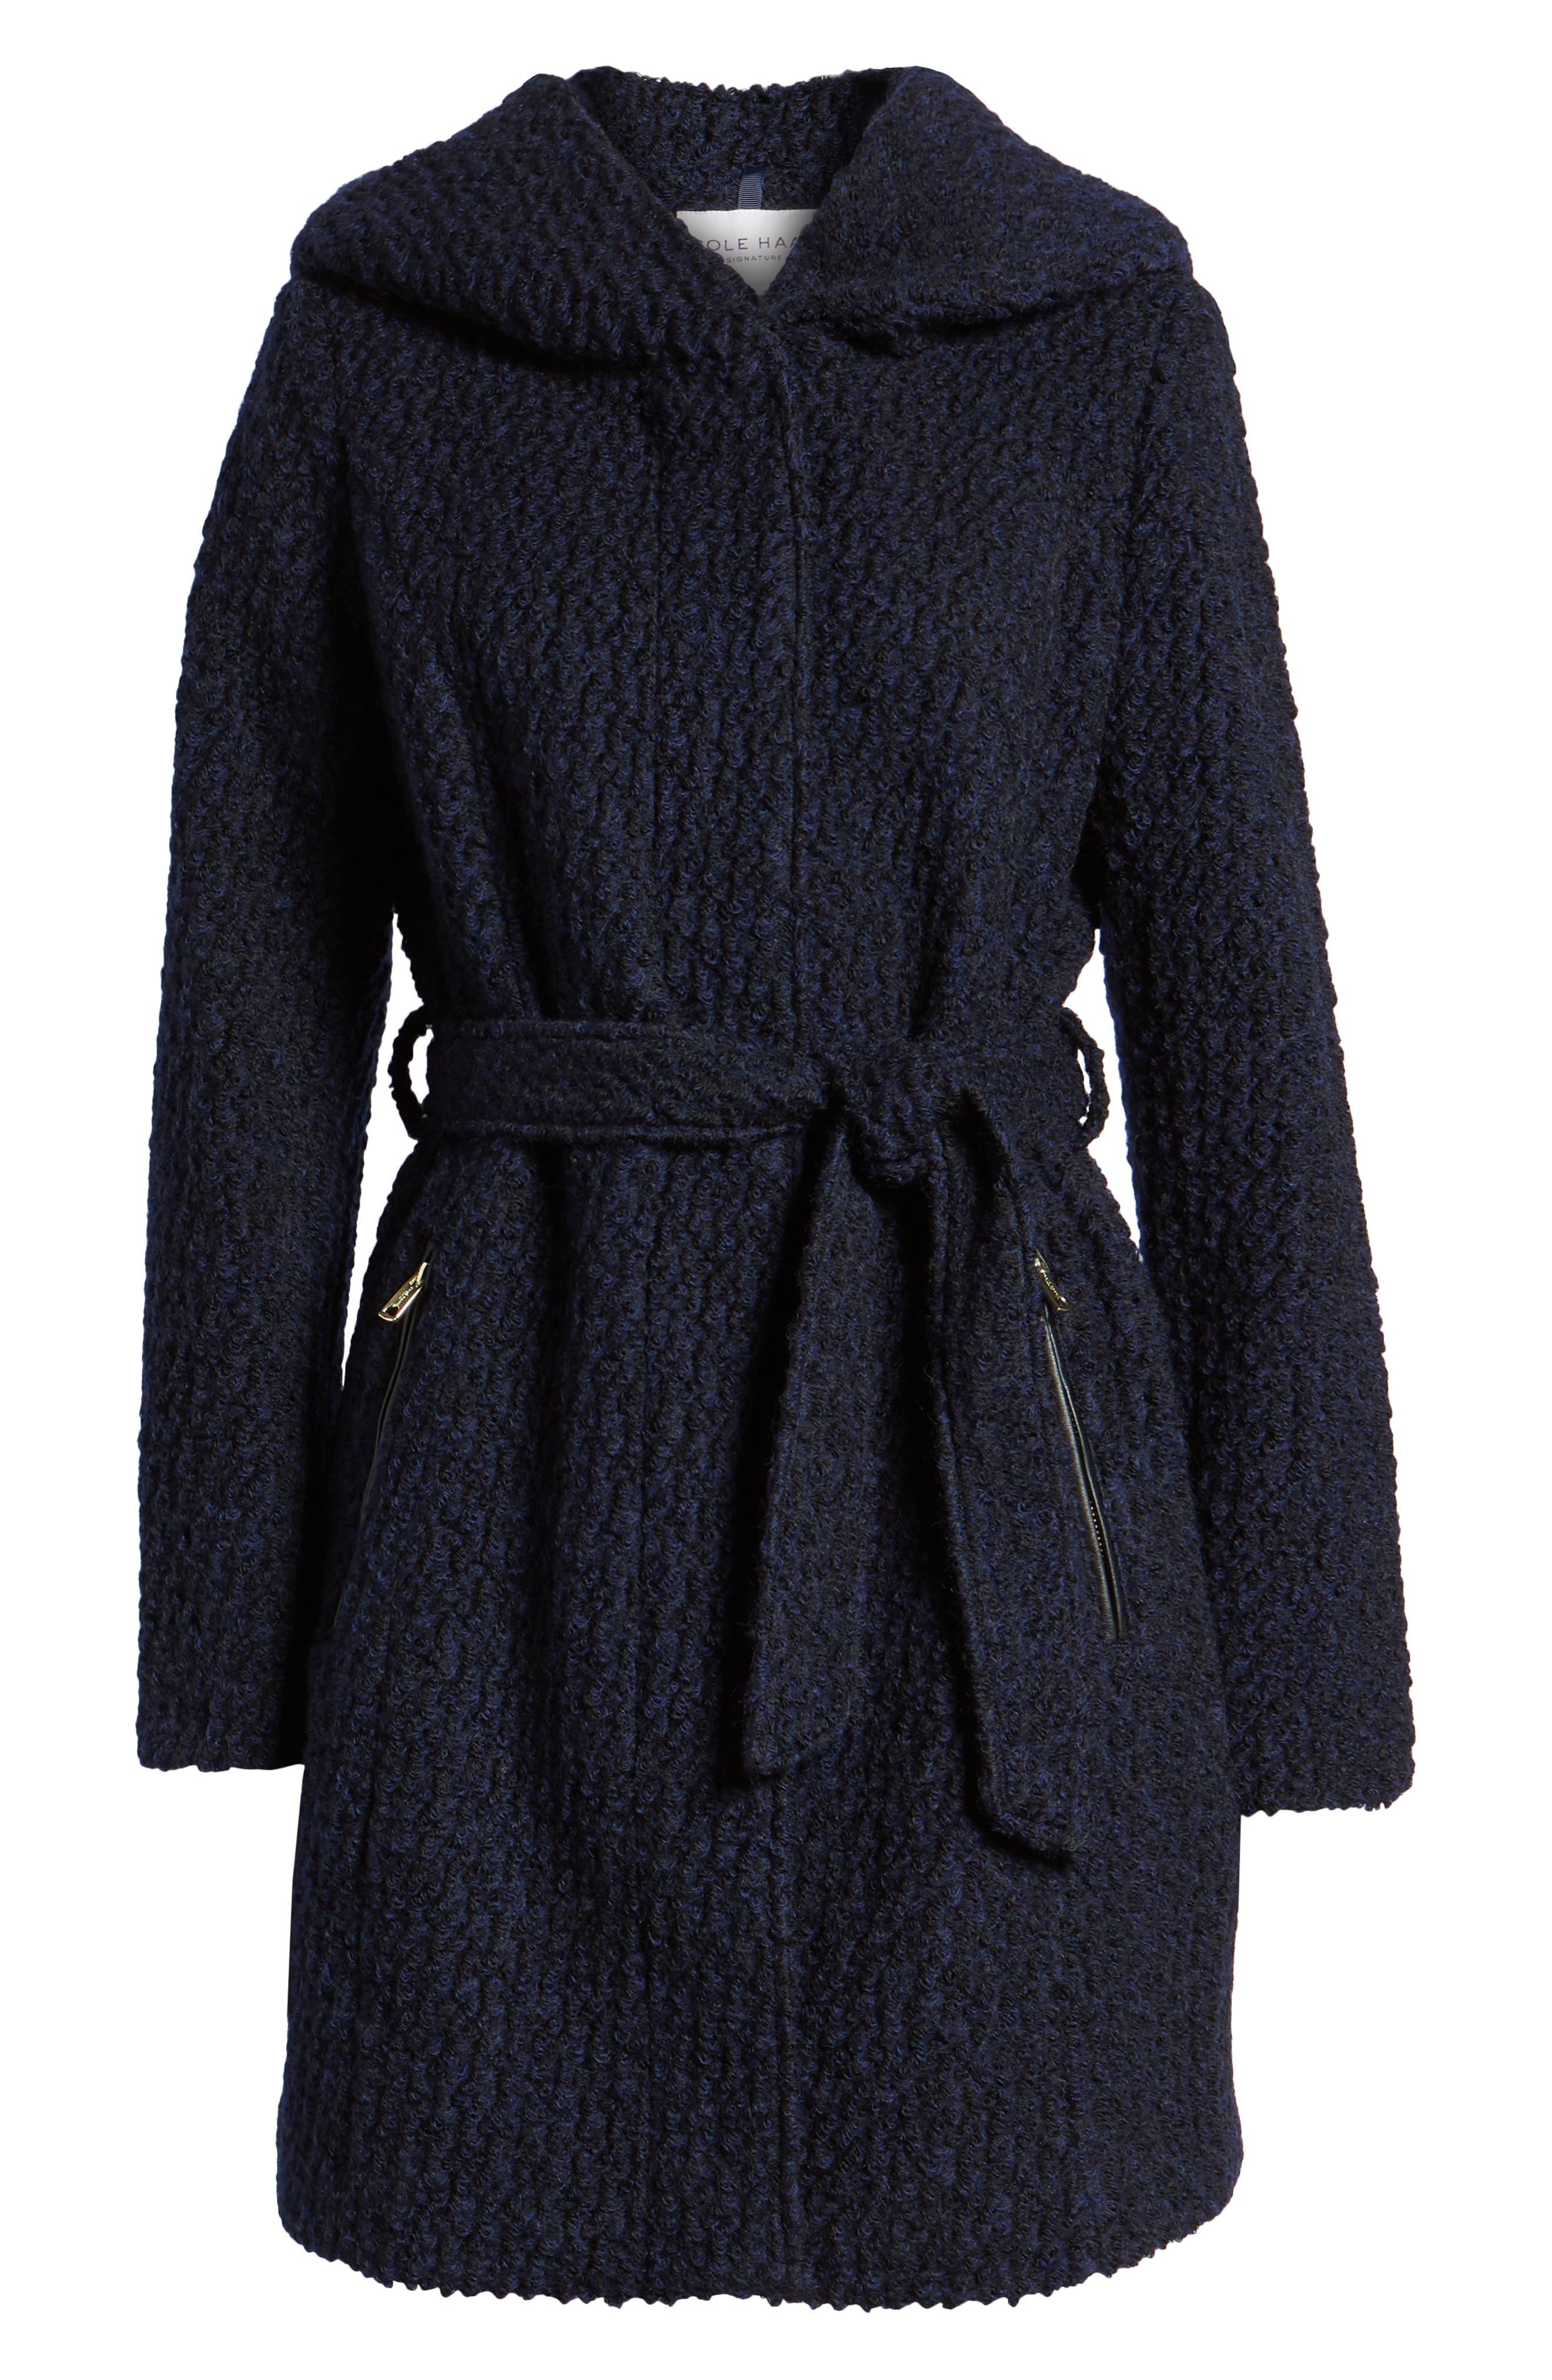 Belted Bouclé Wool Blend Coat,                             Alternate thumbnail 6, color,                             BLACK/ NAVY